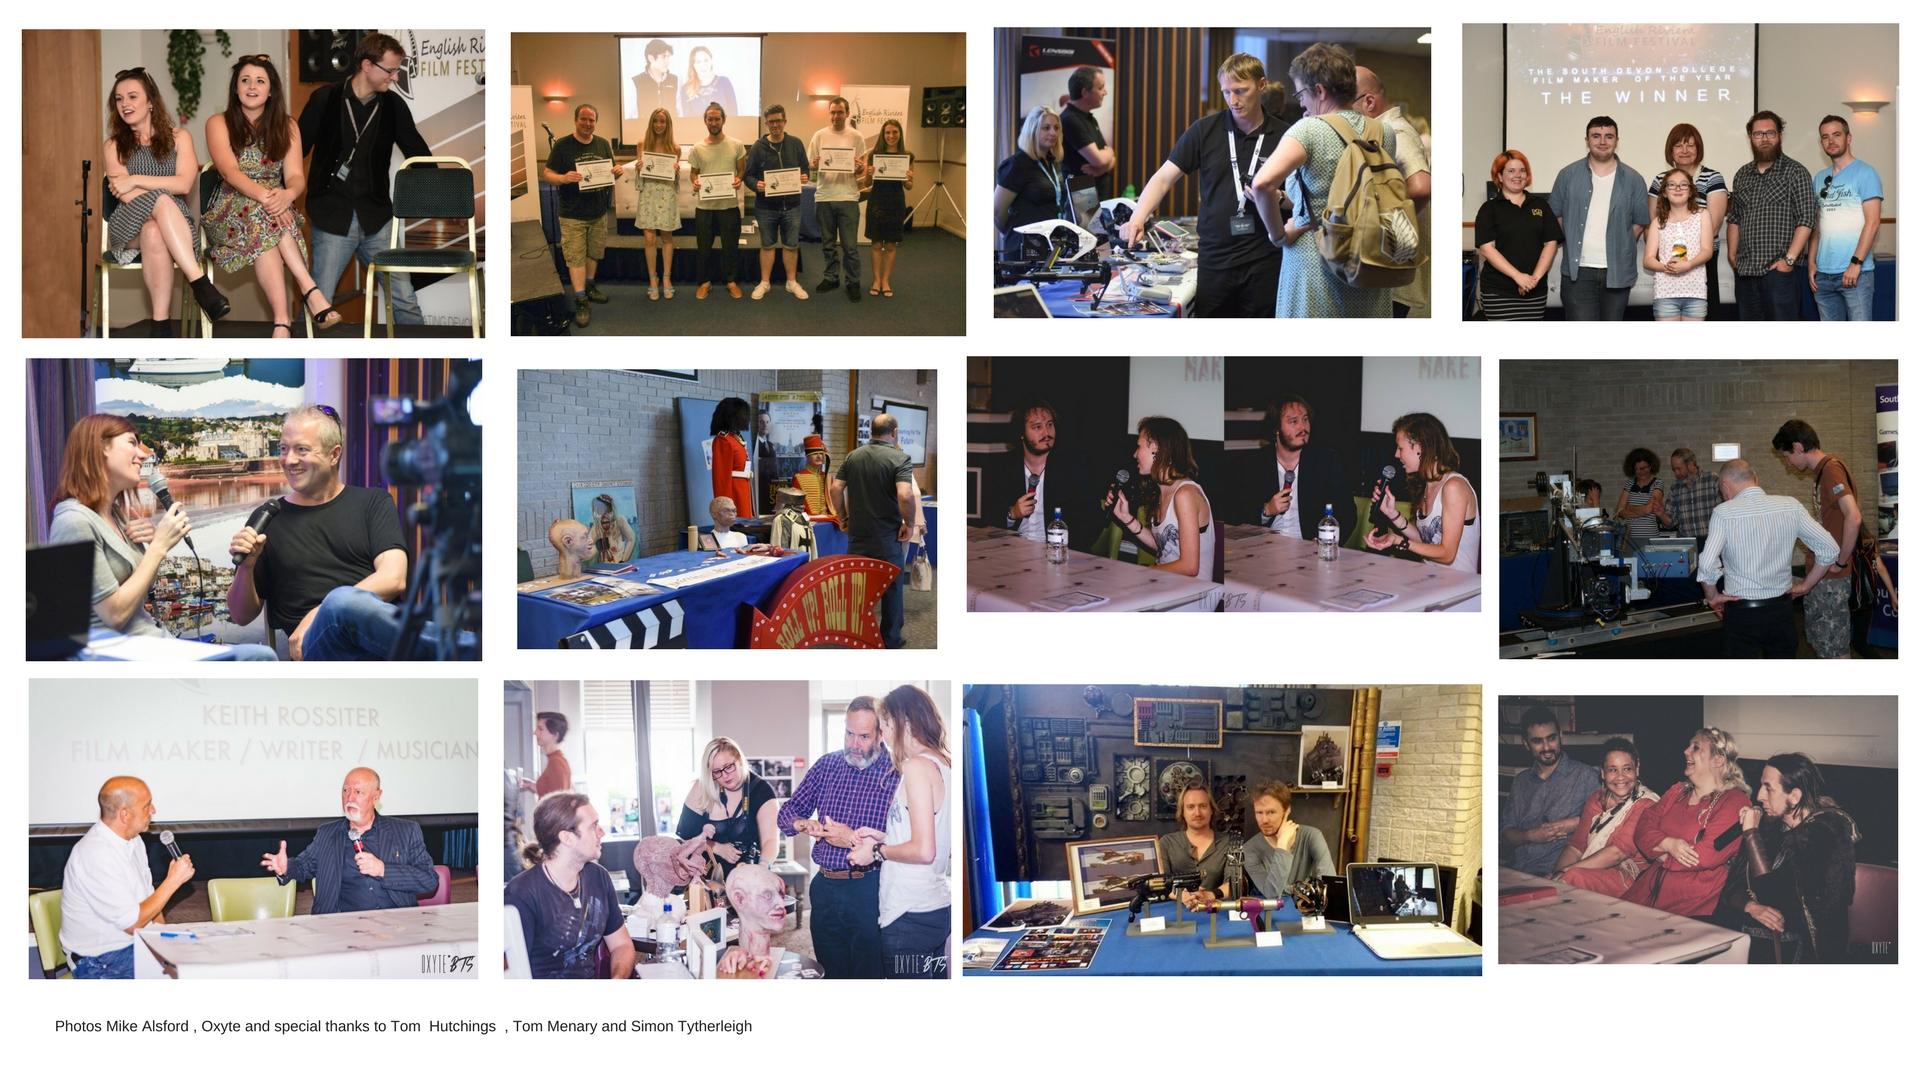 Photos Mike Alsford , Oxyte and specisl thanks to Tom Hutchings , Tom Menery and Simon Tytherleigh (1)